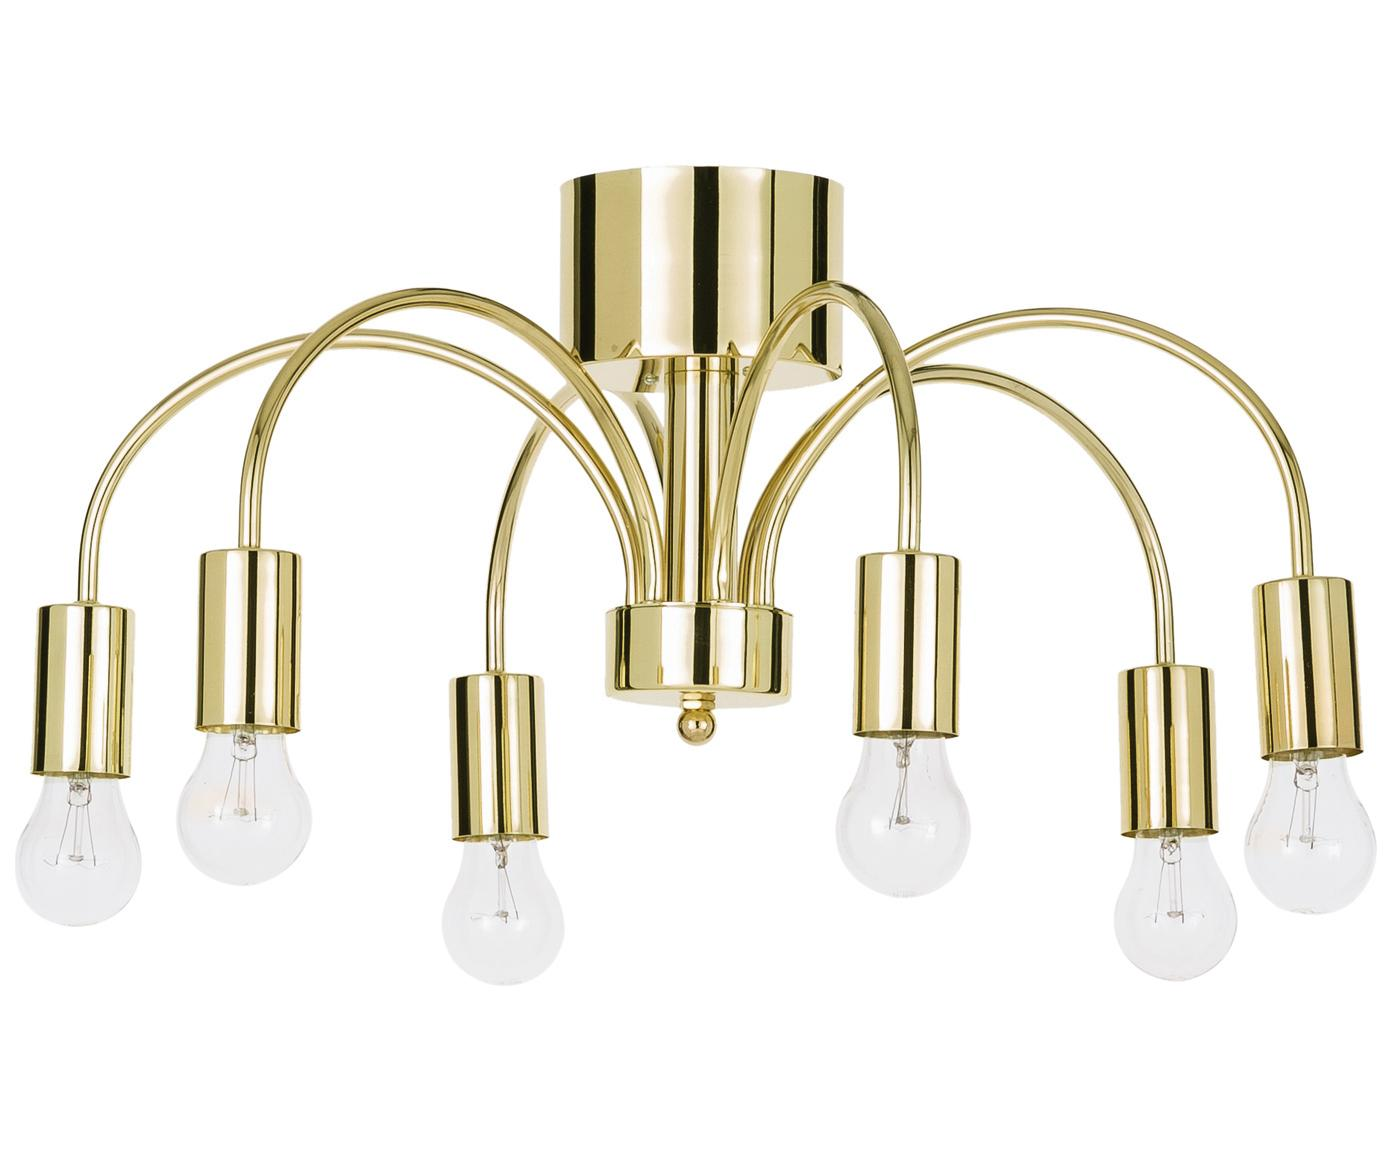 Plafondlamp Grace, Gelakt messing, Goudkleurig, Ø 56 x H 26 cm